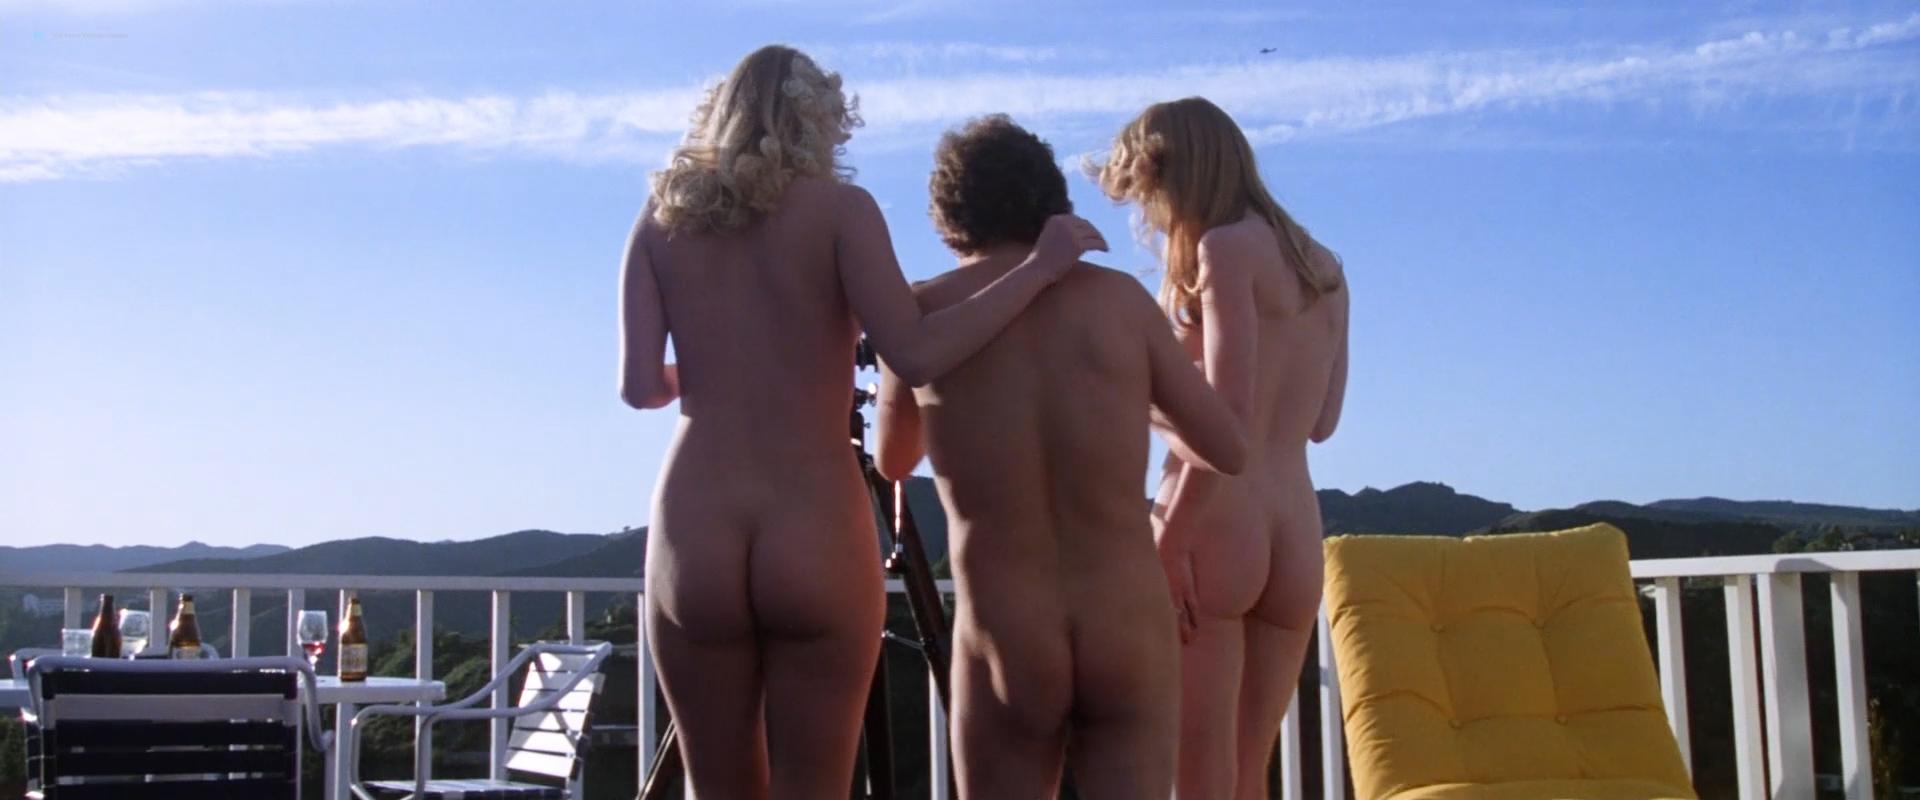 rubenesque women pictures